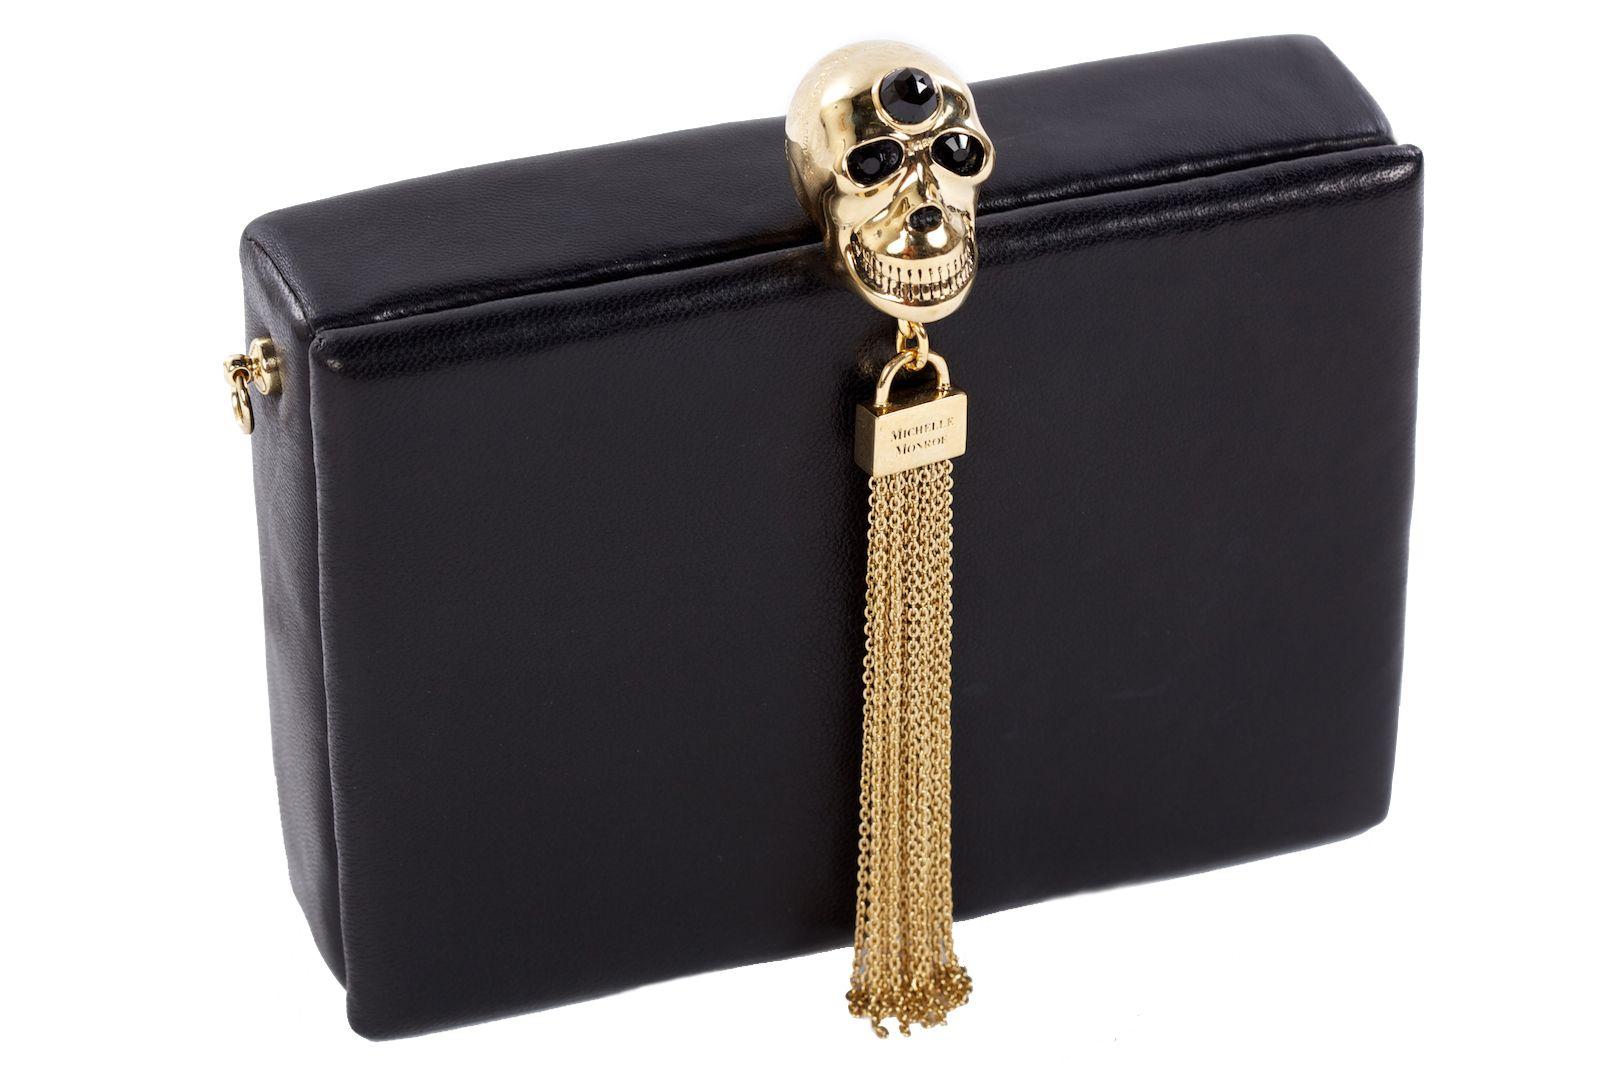 Michelle Monroe Handbags Jet Box Clutch Alene Too